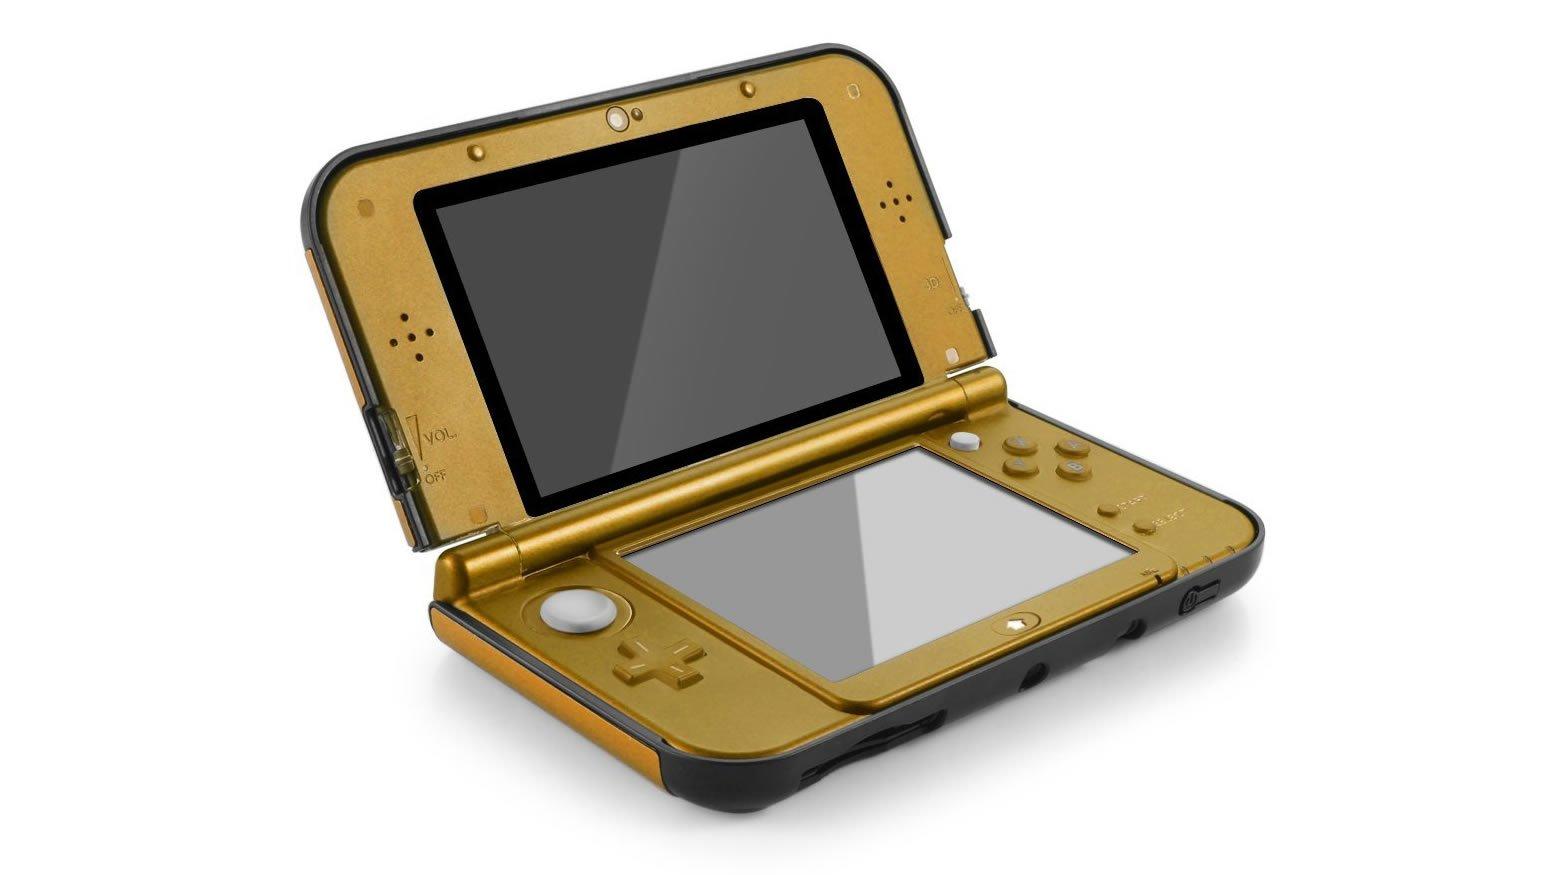 Modojo | The Best Nintendo 3DS Cases